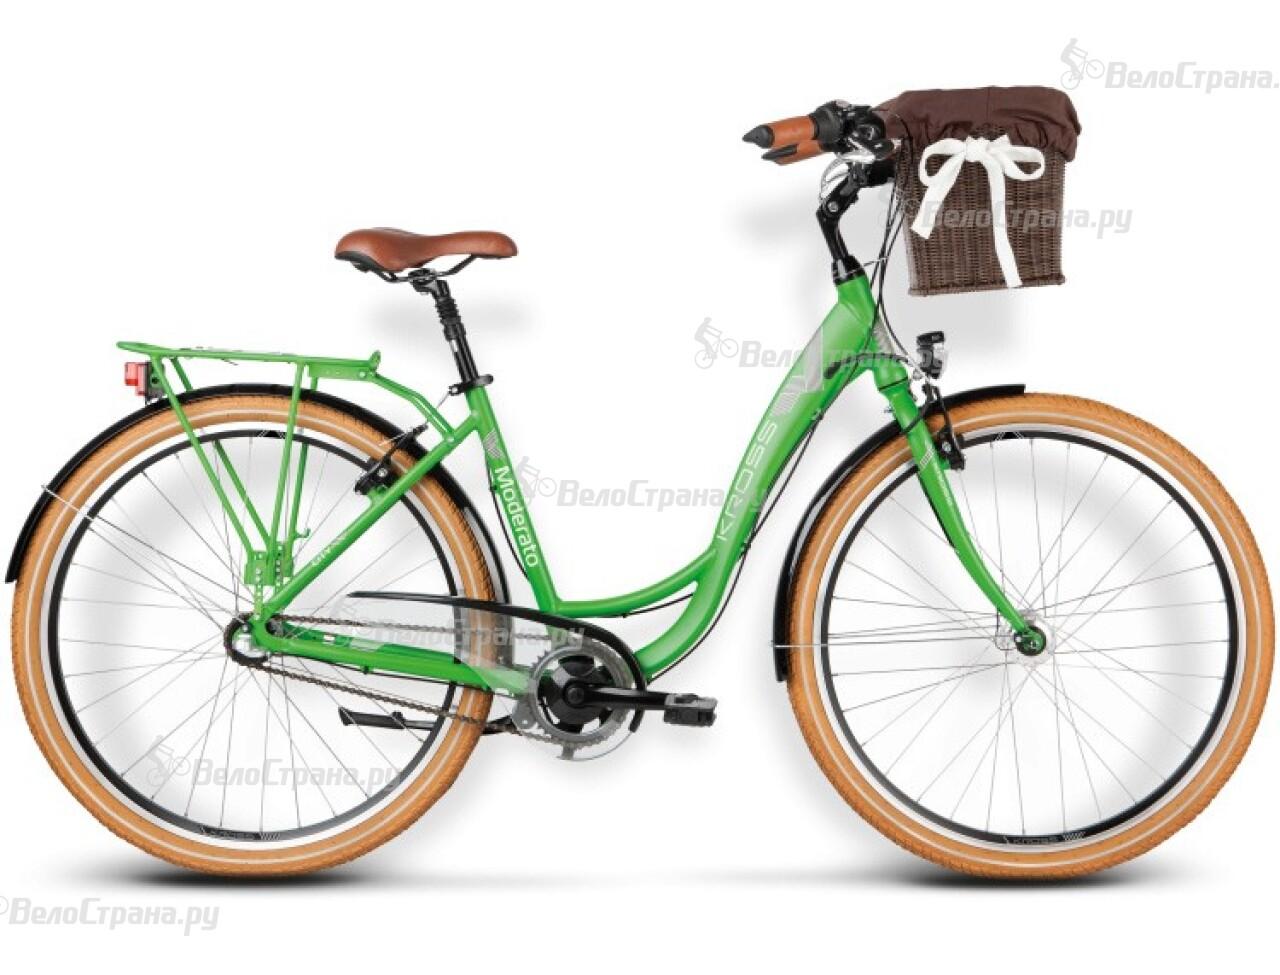 Велосипед Kross Moderato (2016) велосипед kross lea f4 2016